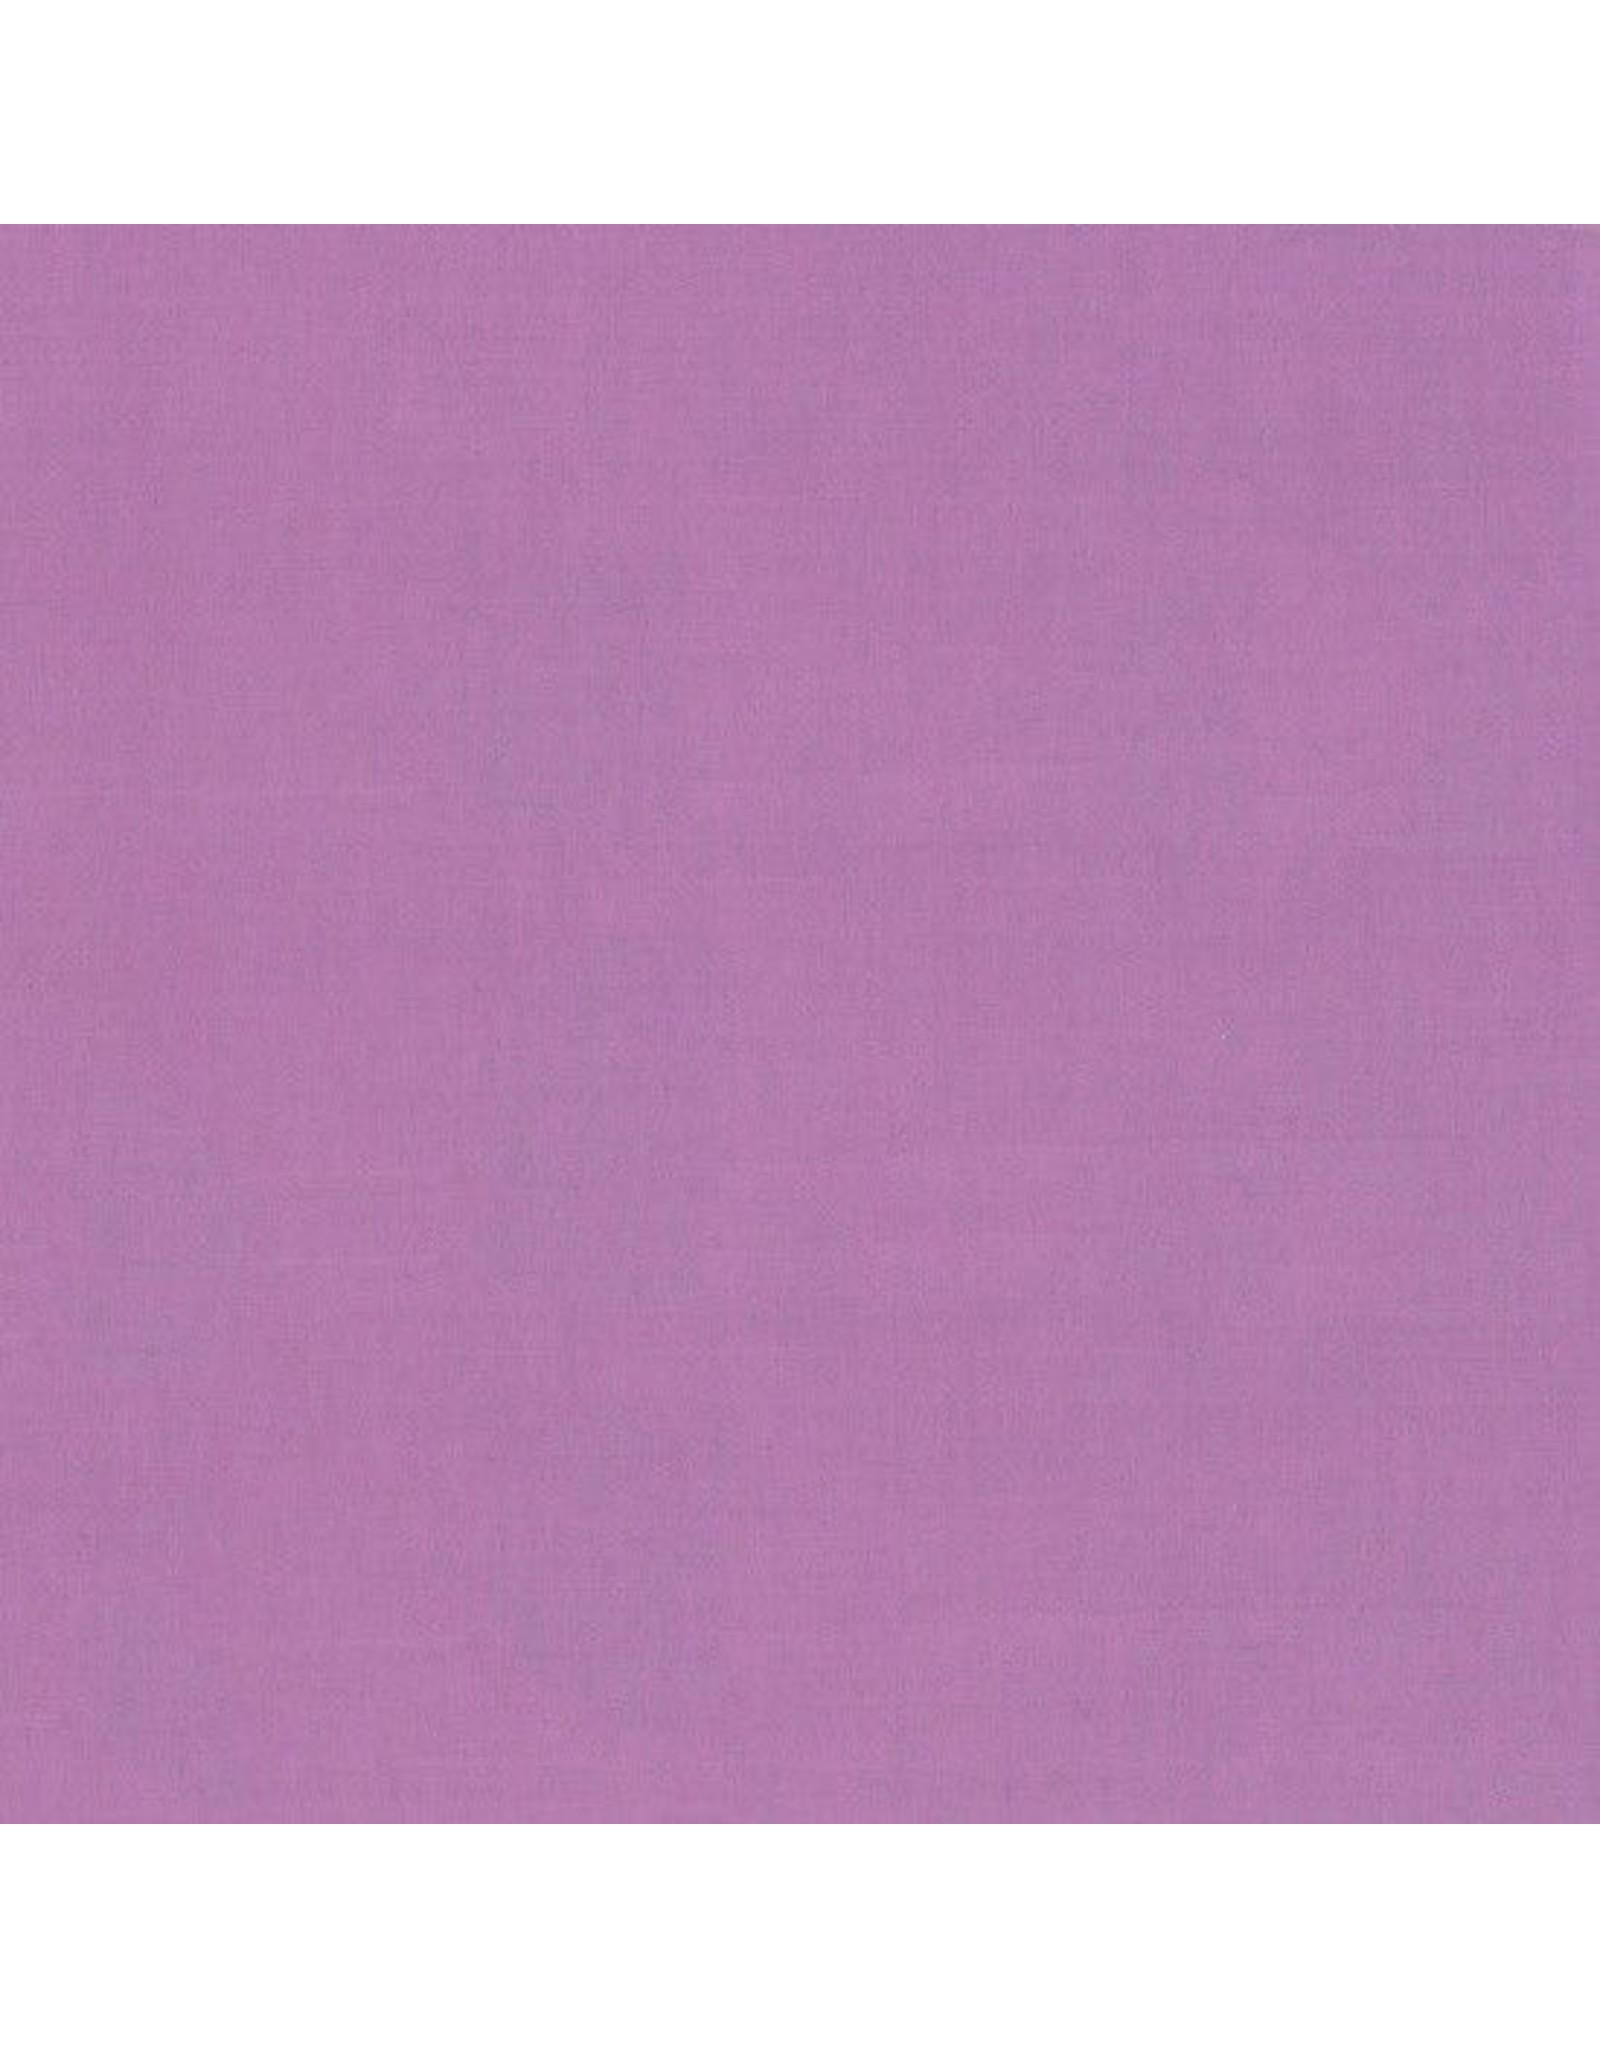 Me+You by Hoffman Fabrics Indah Solids - Mauve